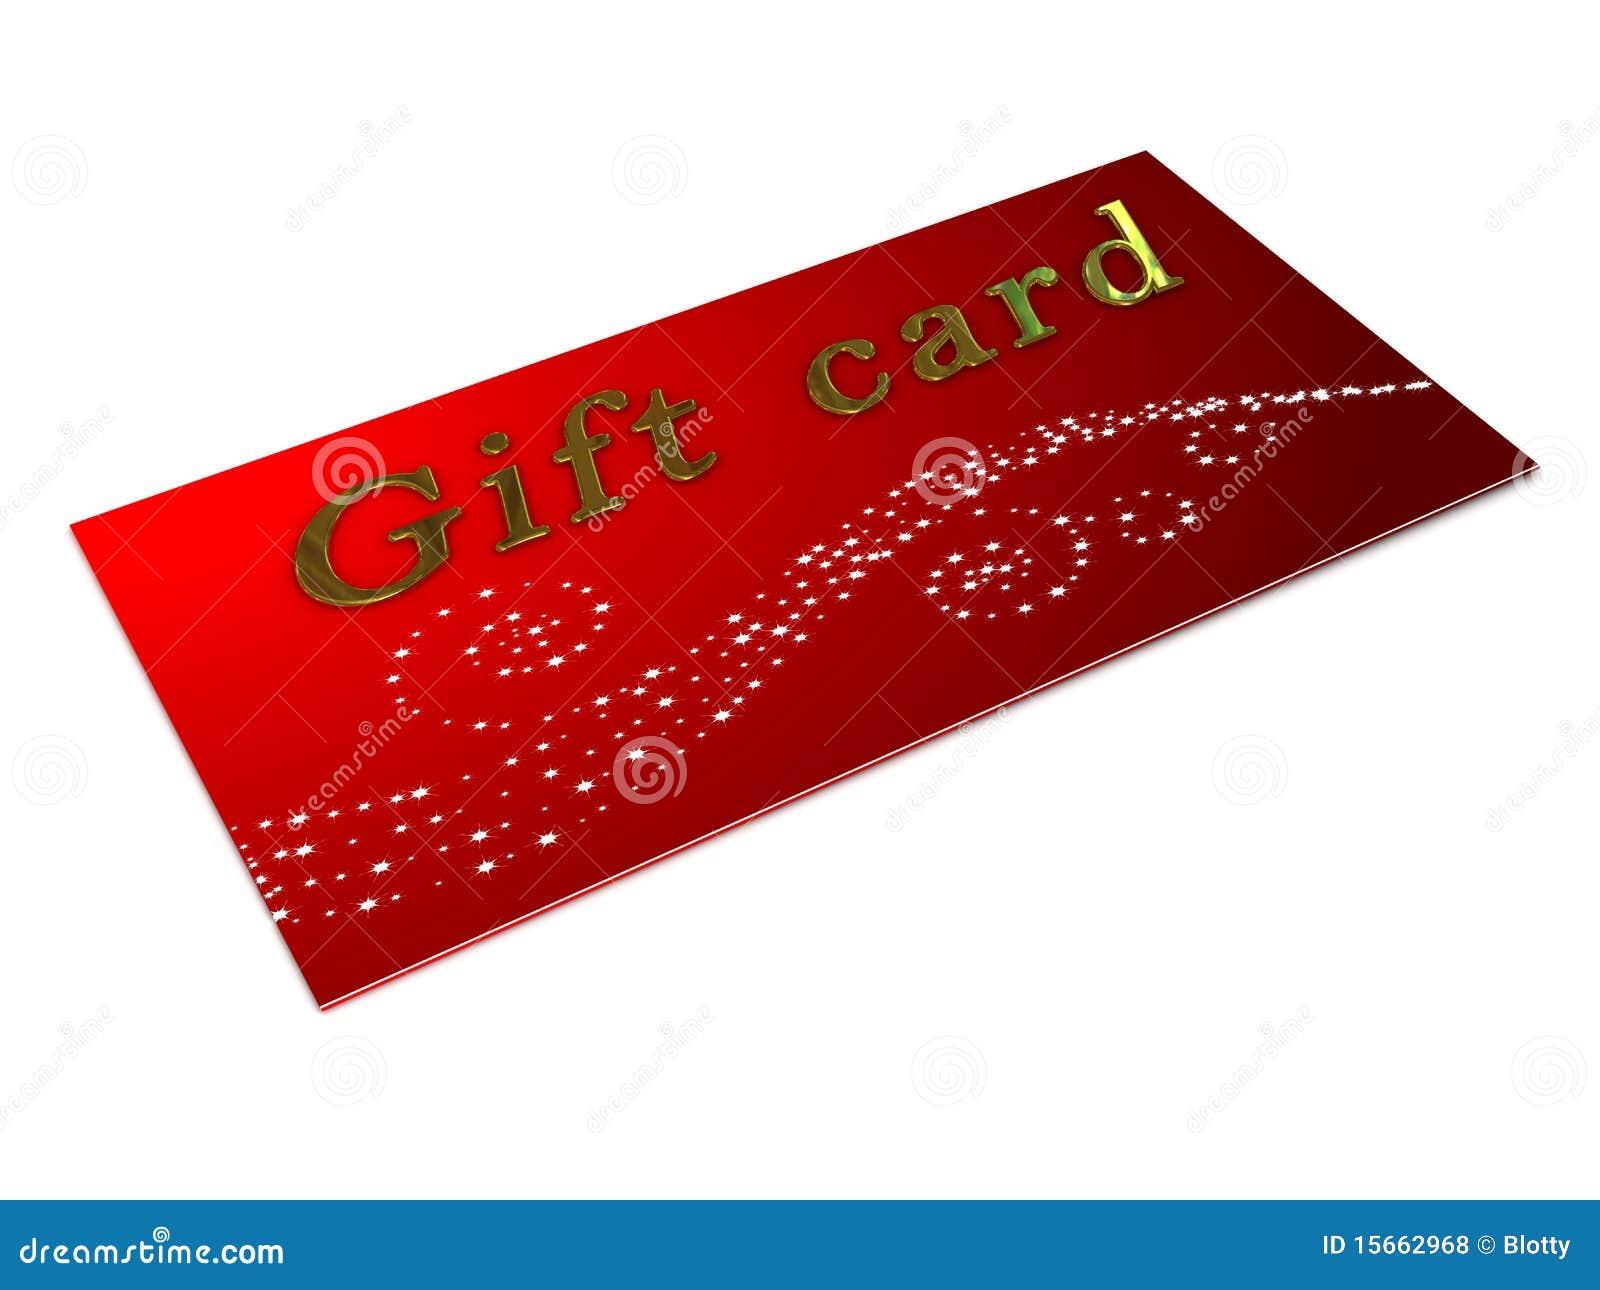 gift card over white background stock illustration